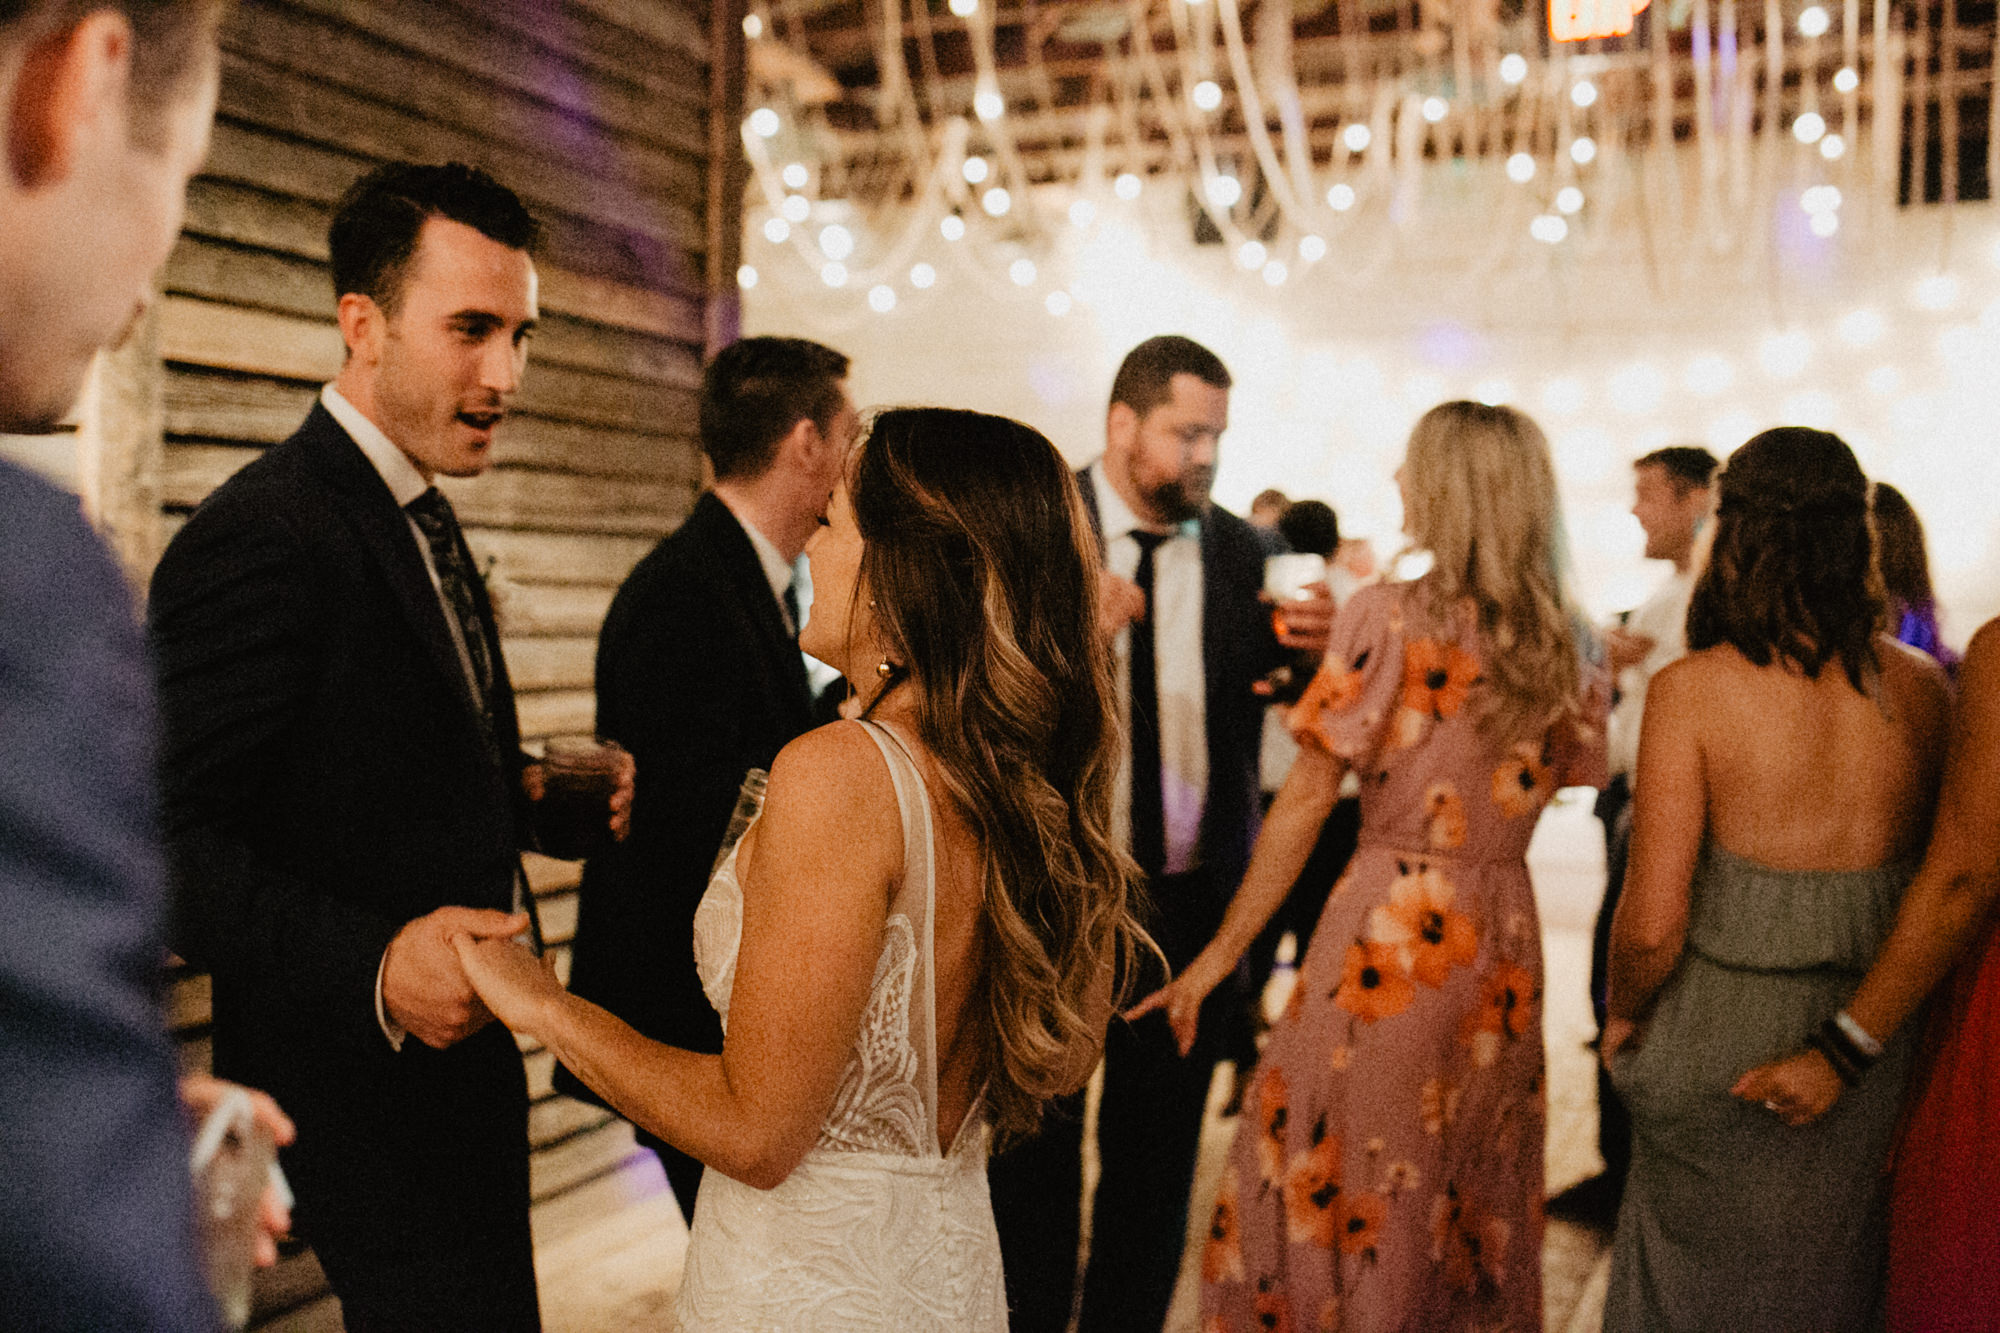 terrain-events-wedding-photographer-58.jpg